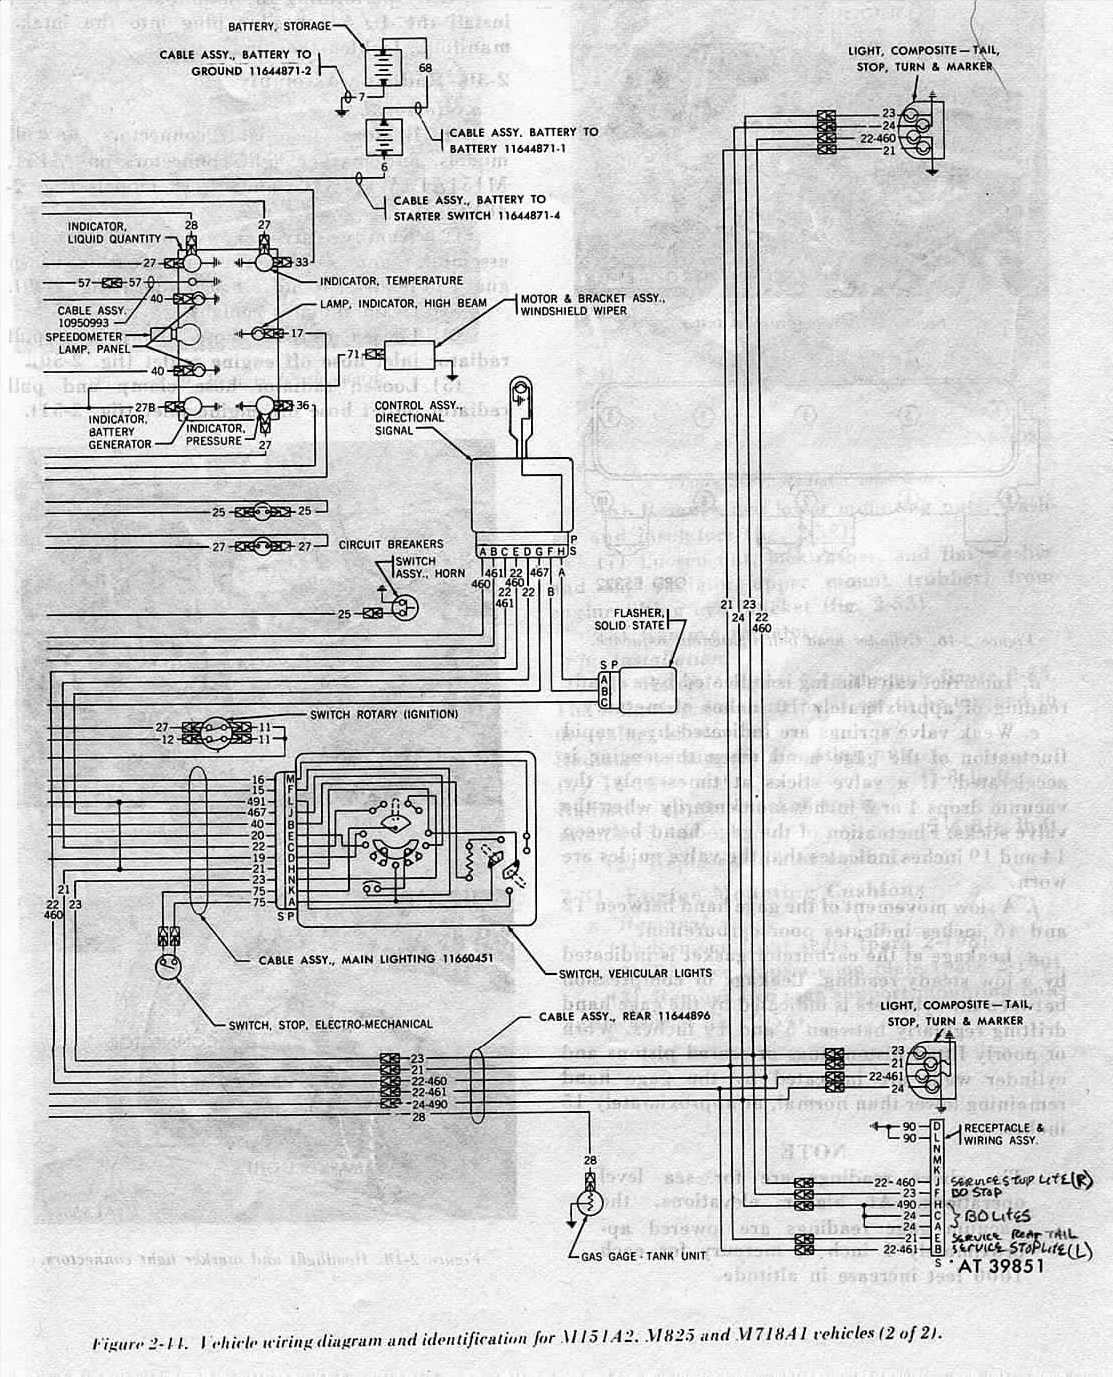 M151a2 Wiring Diagram Bookmark About 2000 Evinrude Remote Control Data Rh 9 12 6 Reisen Fuer Meister De M38